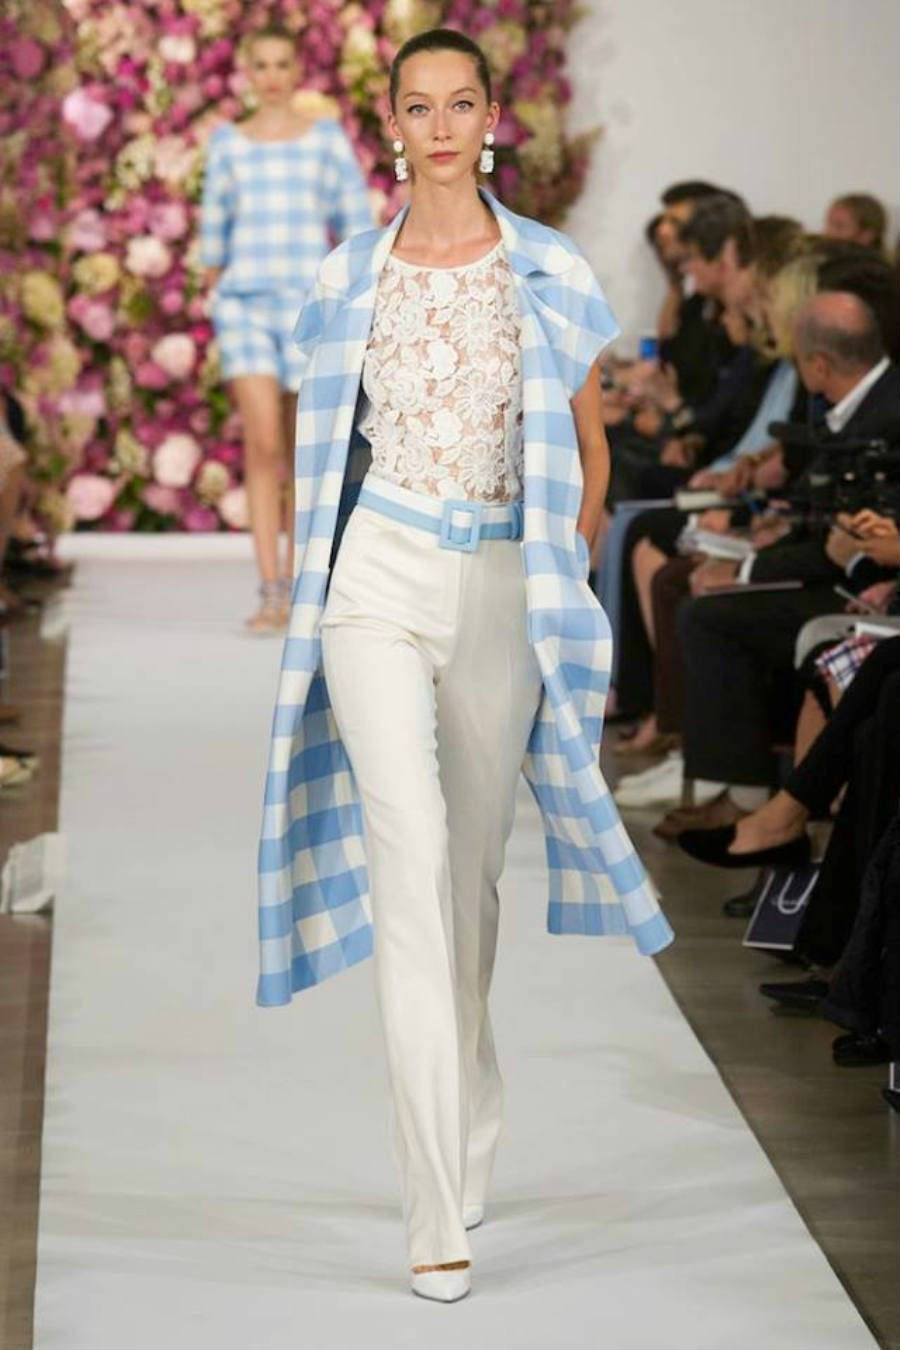 New York Fashion Week Spring 2015 Oscar de la Renta! See more at: http://www.clothesonyou.com/new-york-fashion-week-spring-2015-oscar-de-la-renta